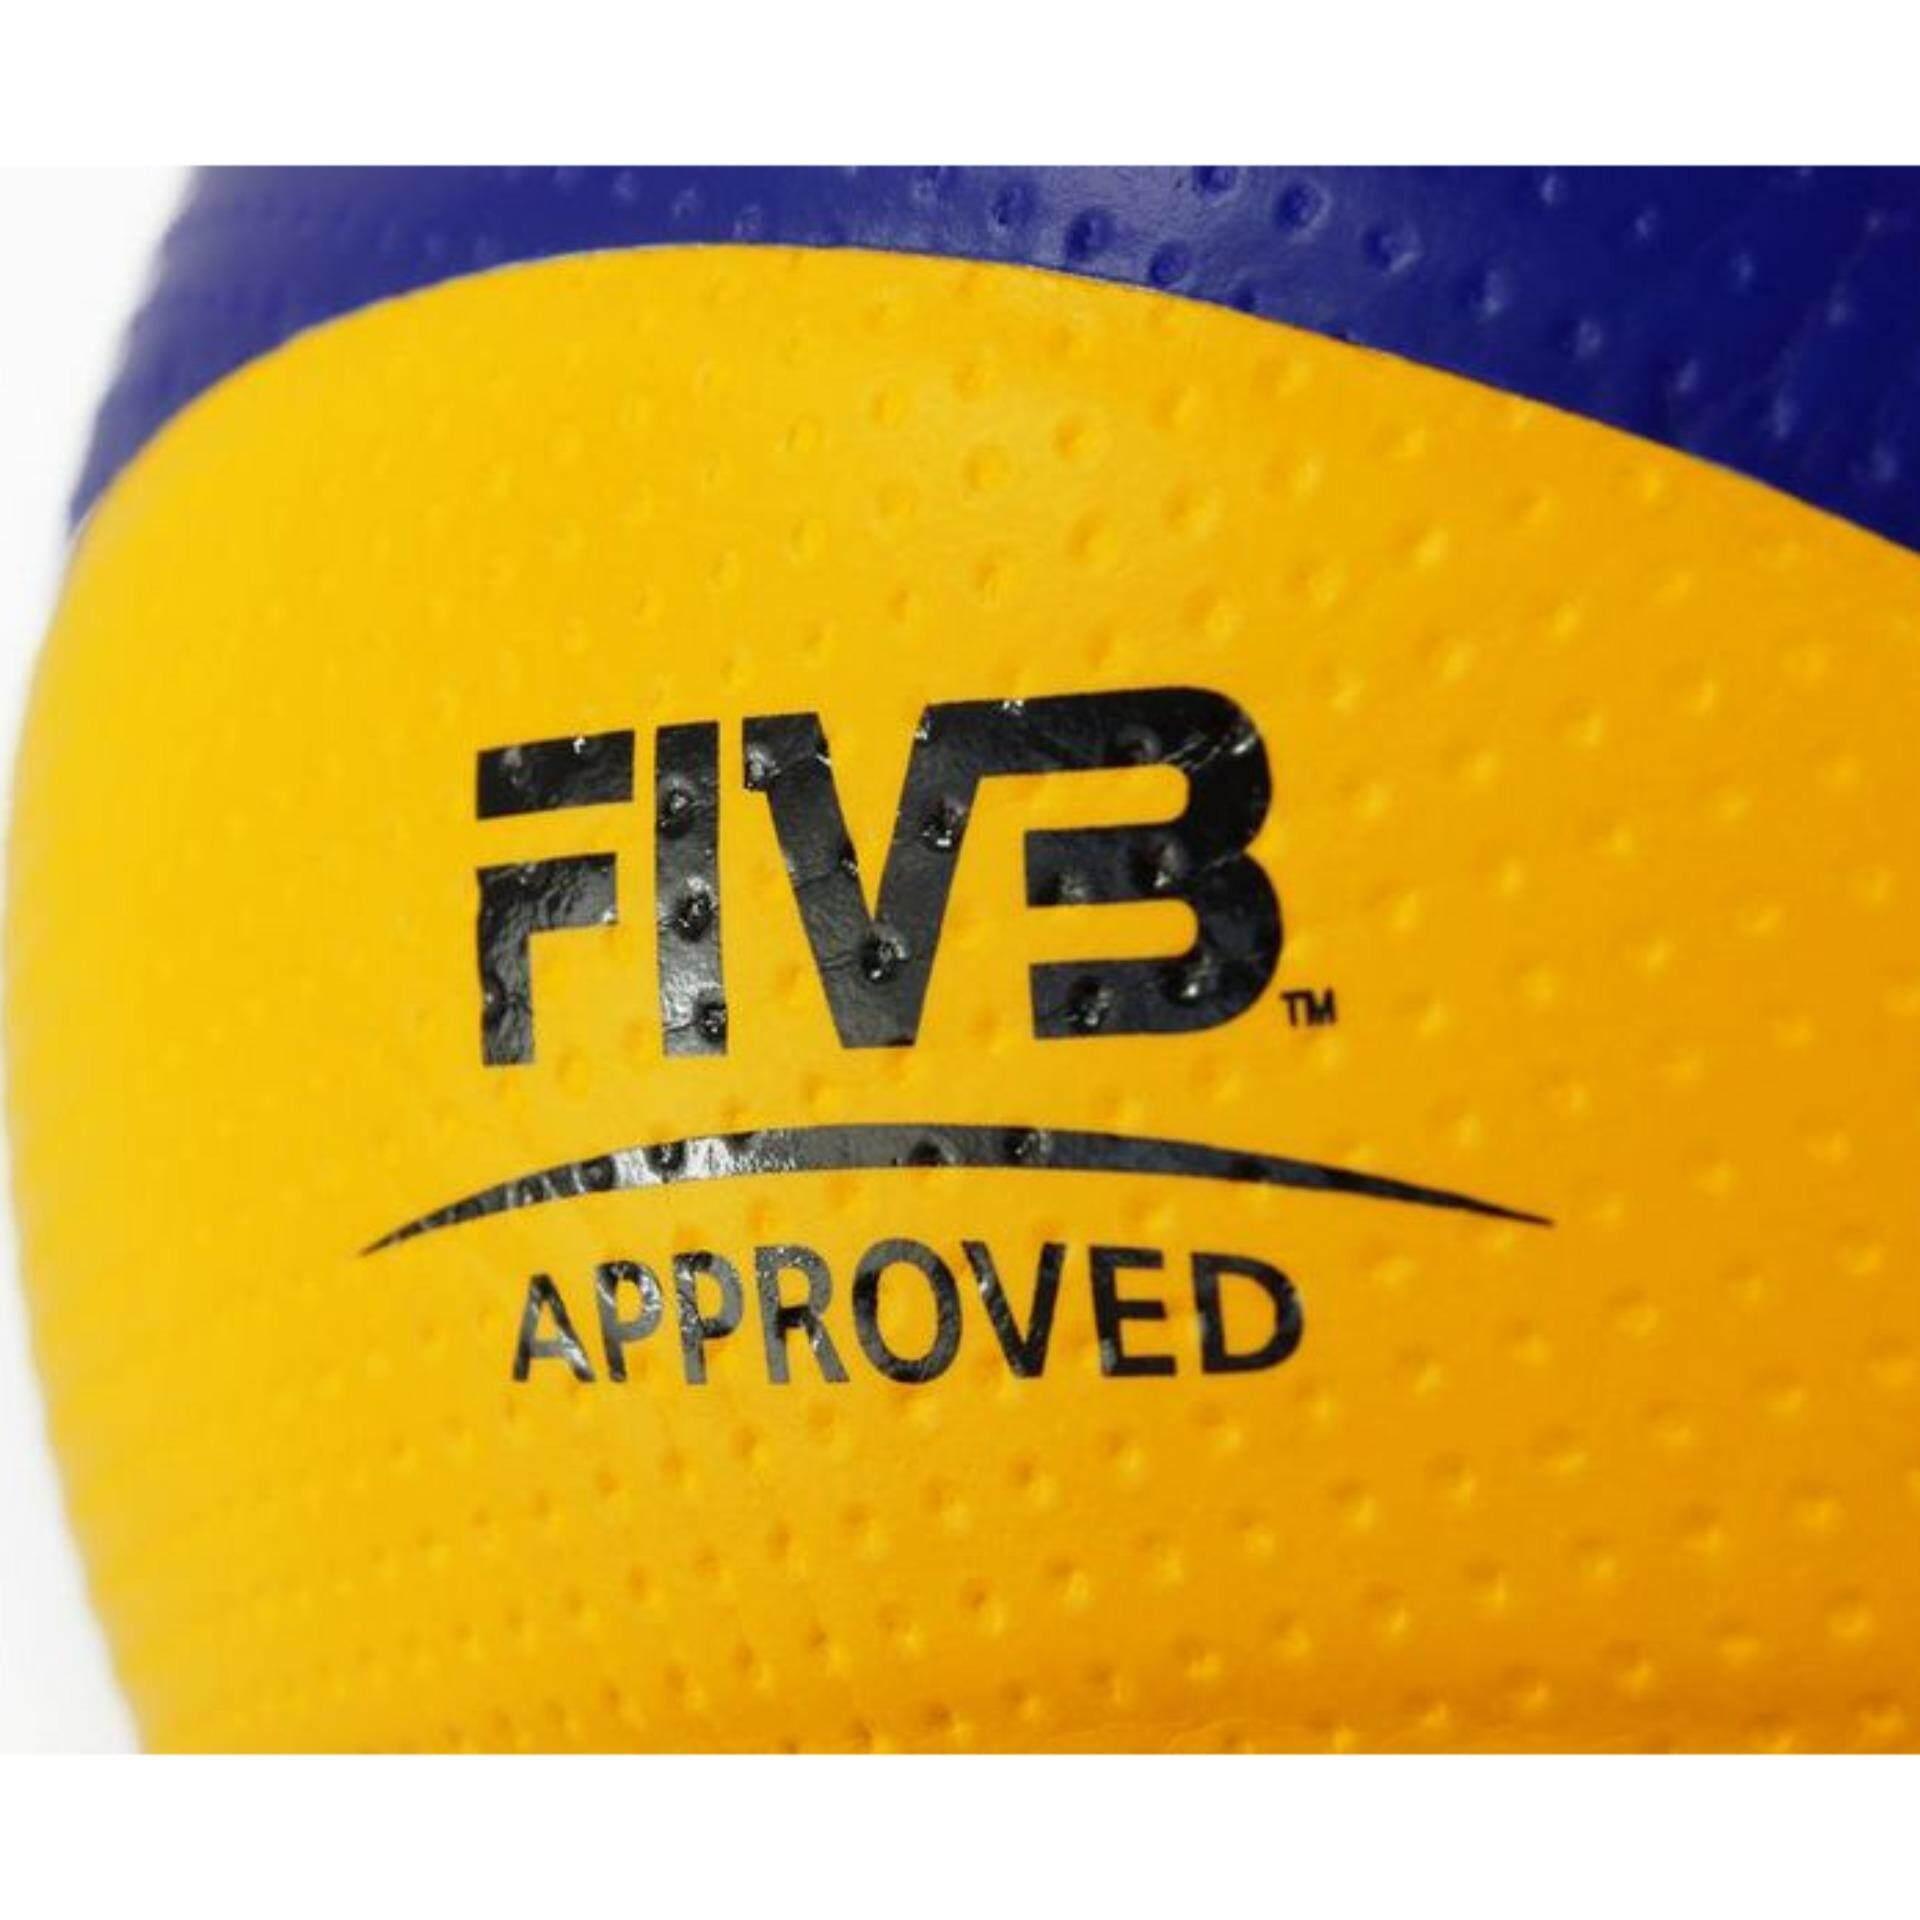 Fitur Mikasa Mva 300 Volleyball Soft Pu Volley Ball Yellow Dan Harga Net Bola Voli